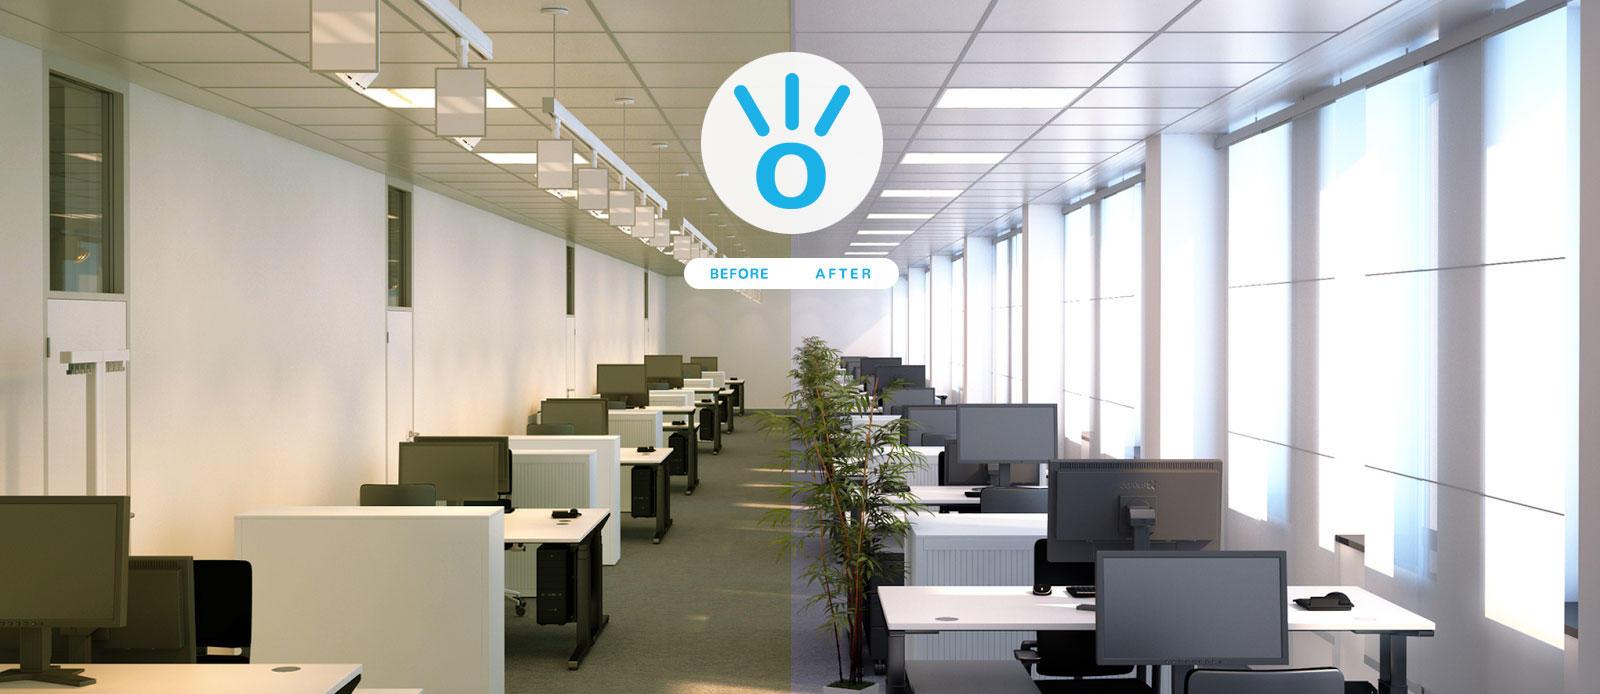 NeoBright: Atlanta Commercial LED Retrofit Lighting   Free Energy Efficiancy Audit & Consulting image 1